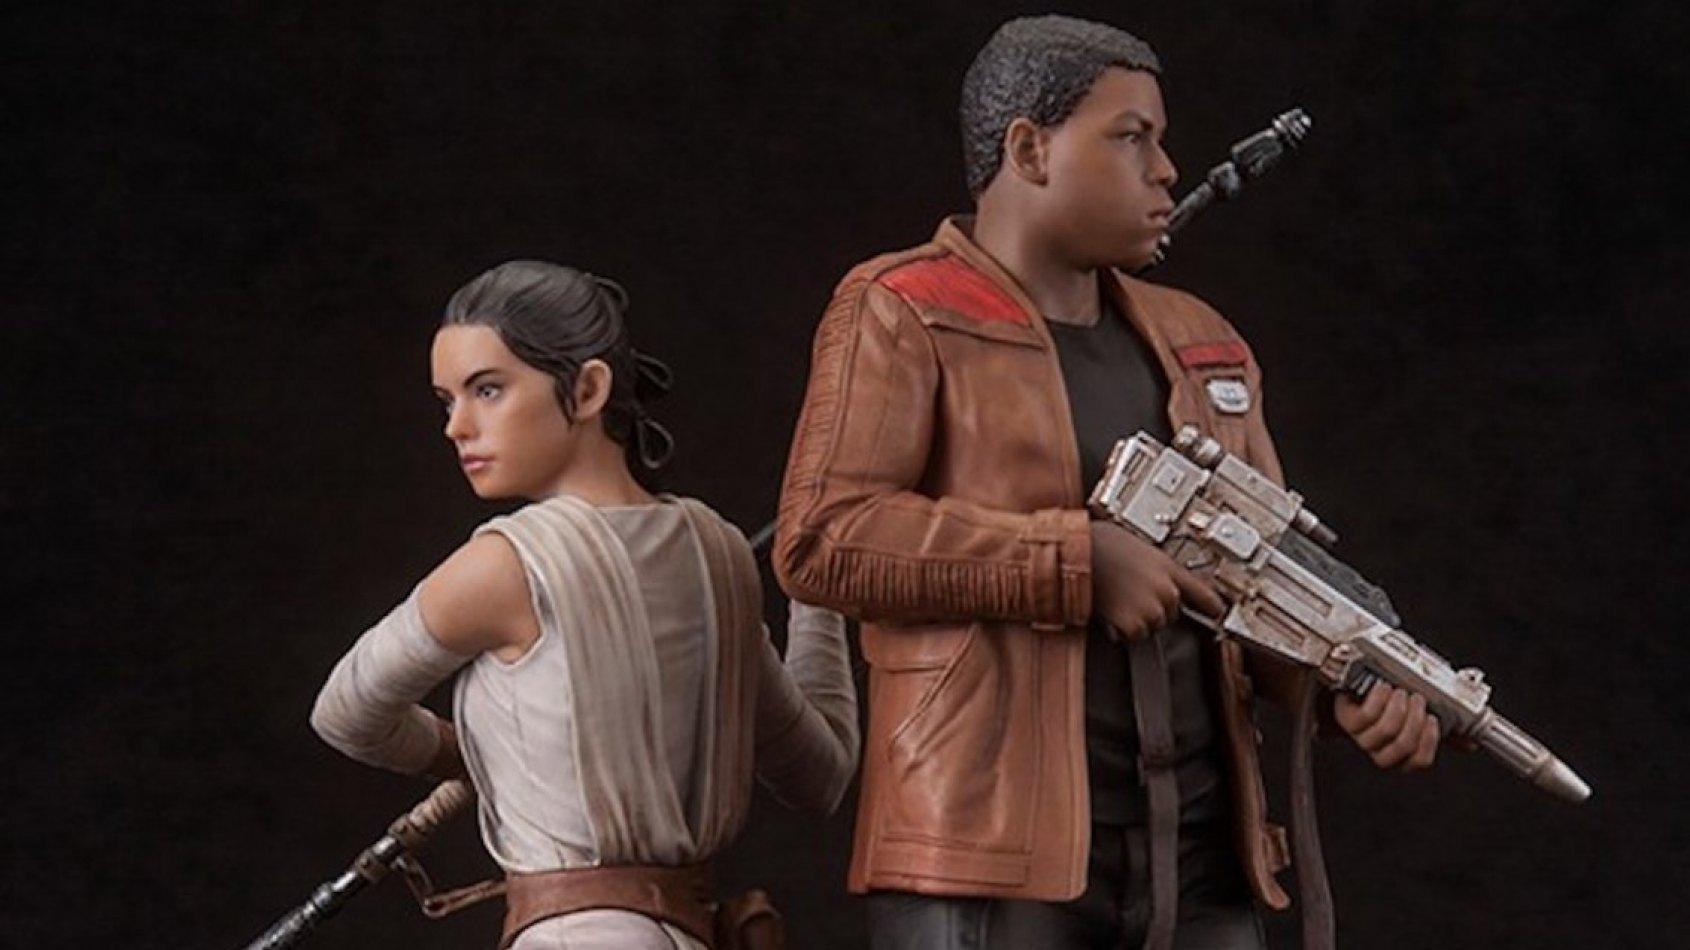 Rey et Finn en figurine ArtFX par Kotobukiya